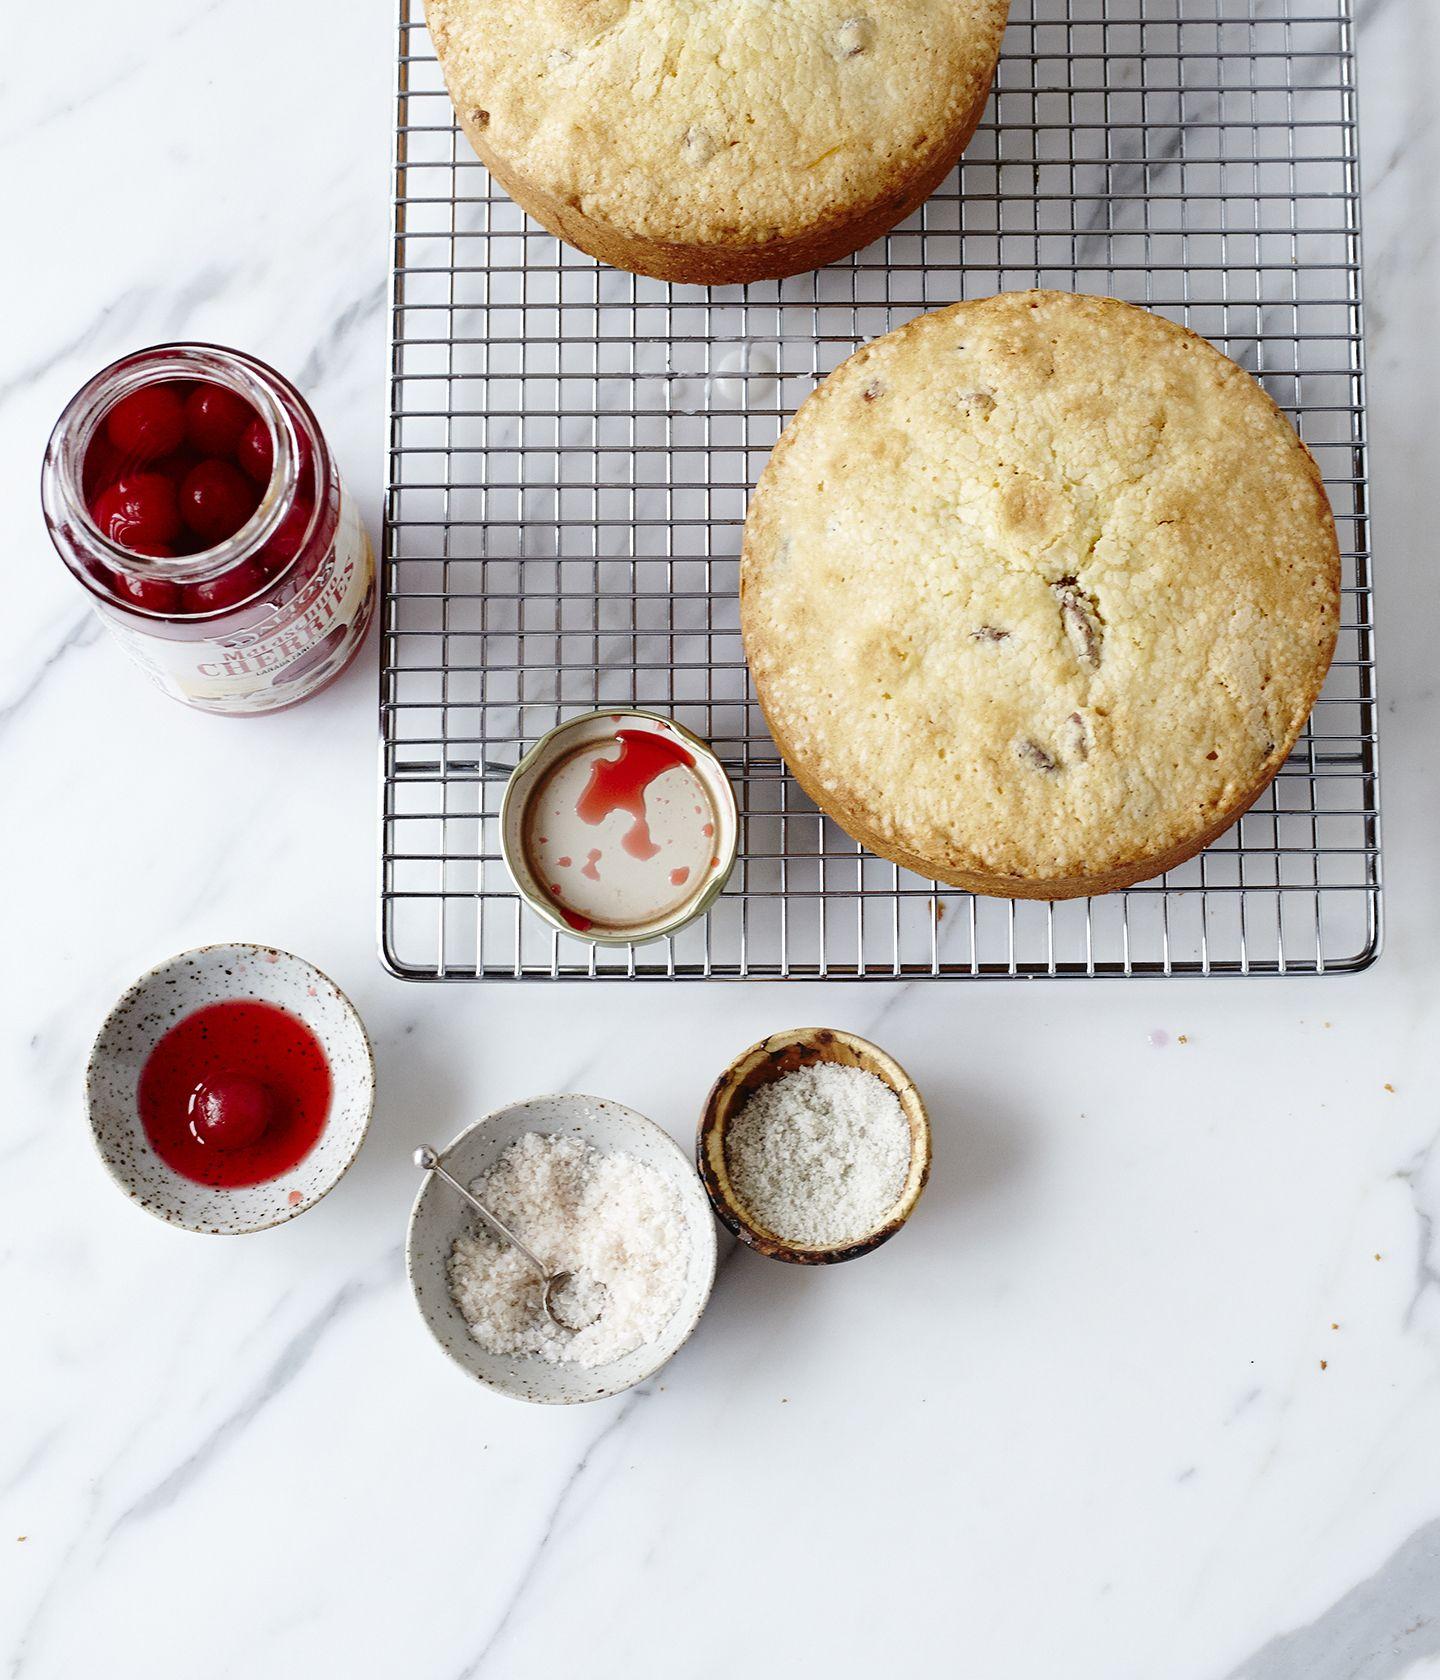 Herriott Grace Handmade In Canada Lecker Picknick Kuchen Gesunde Kuchen Rezepte